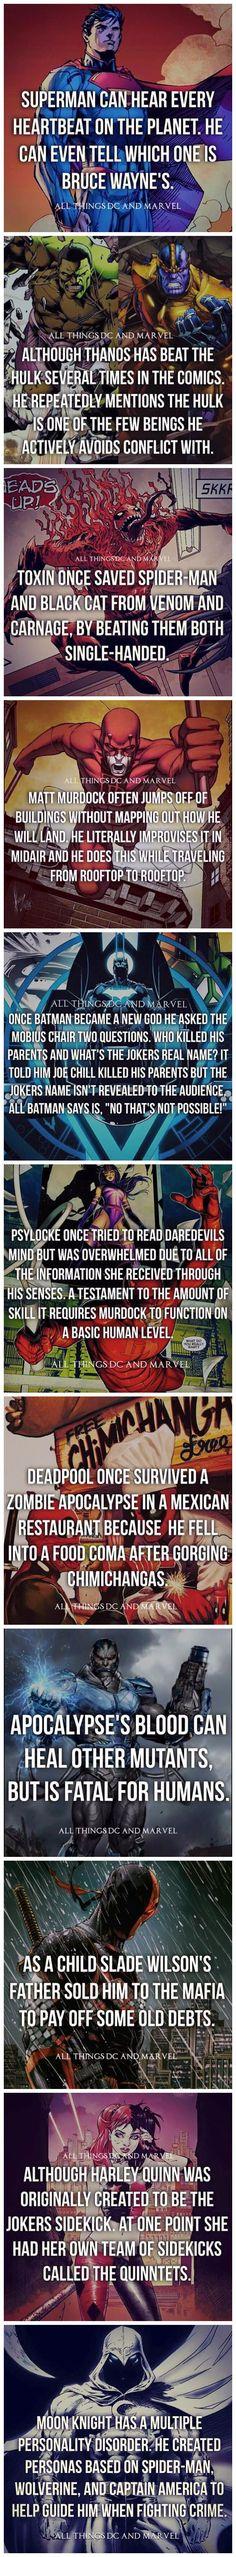 Superhero Facts: Part 1